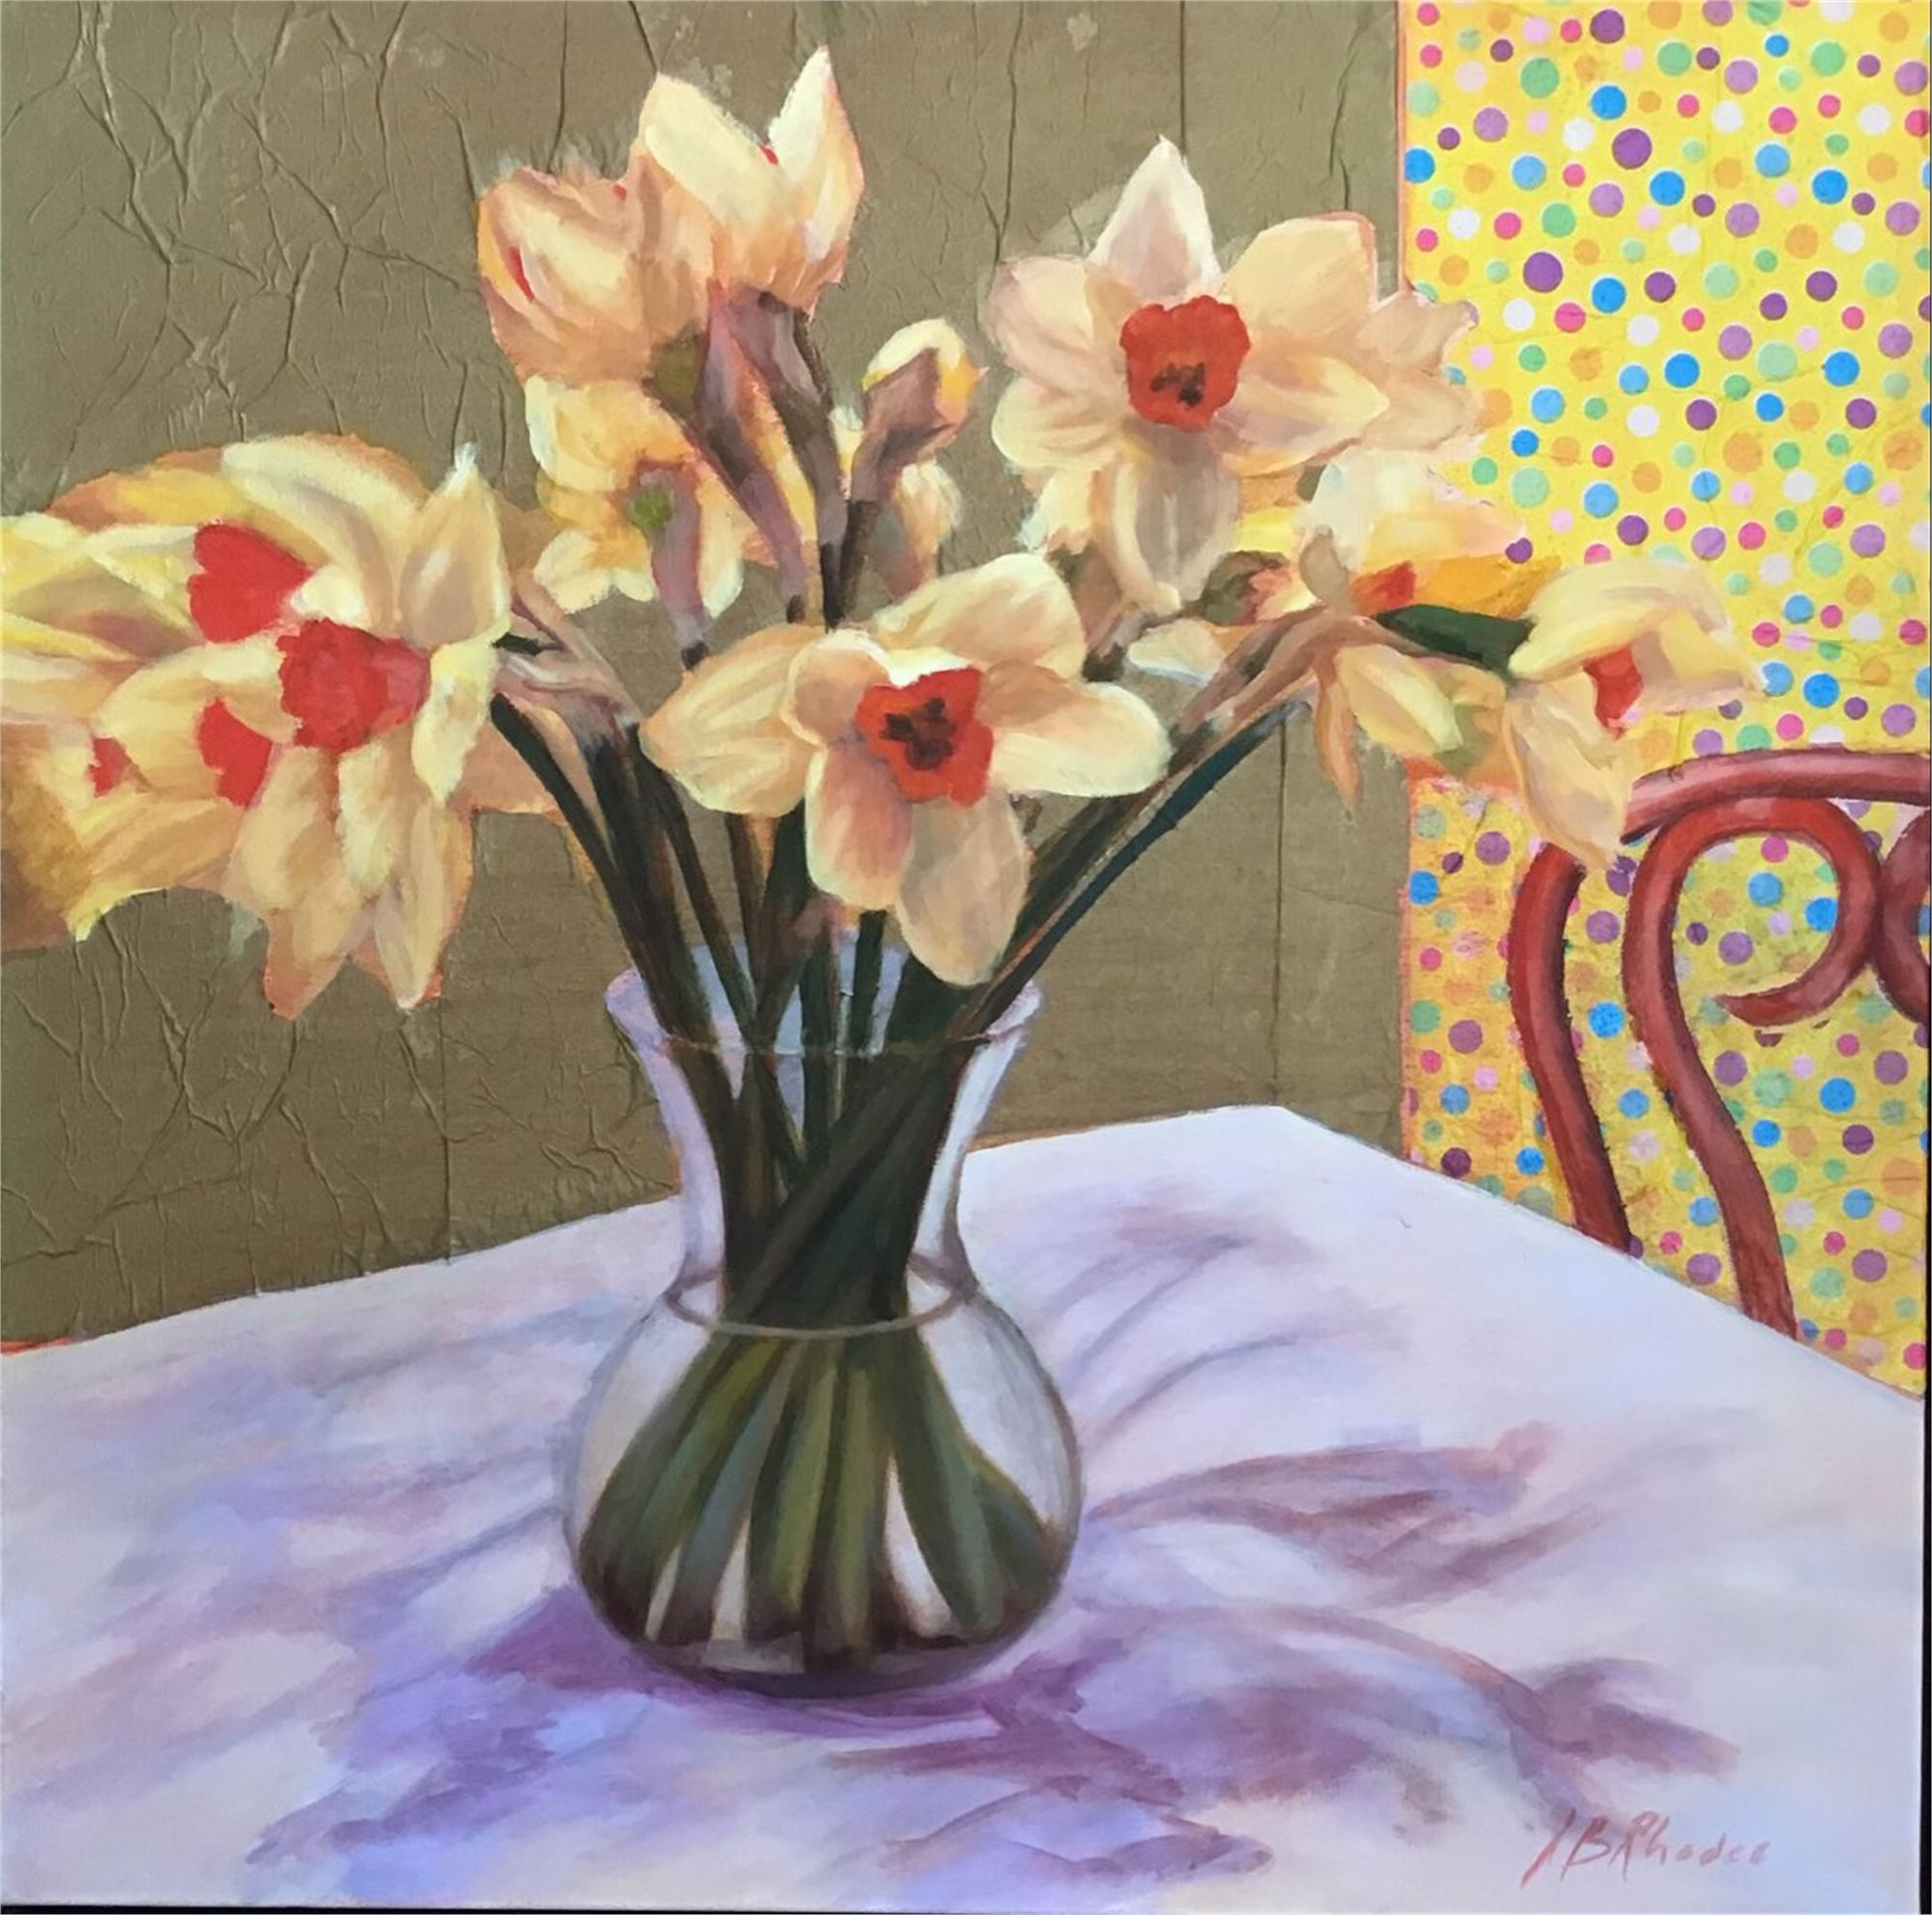 Polka Dots and Daffodils by Ann B. Rhodes